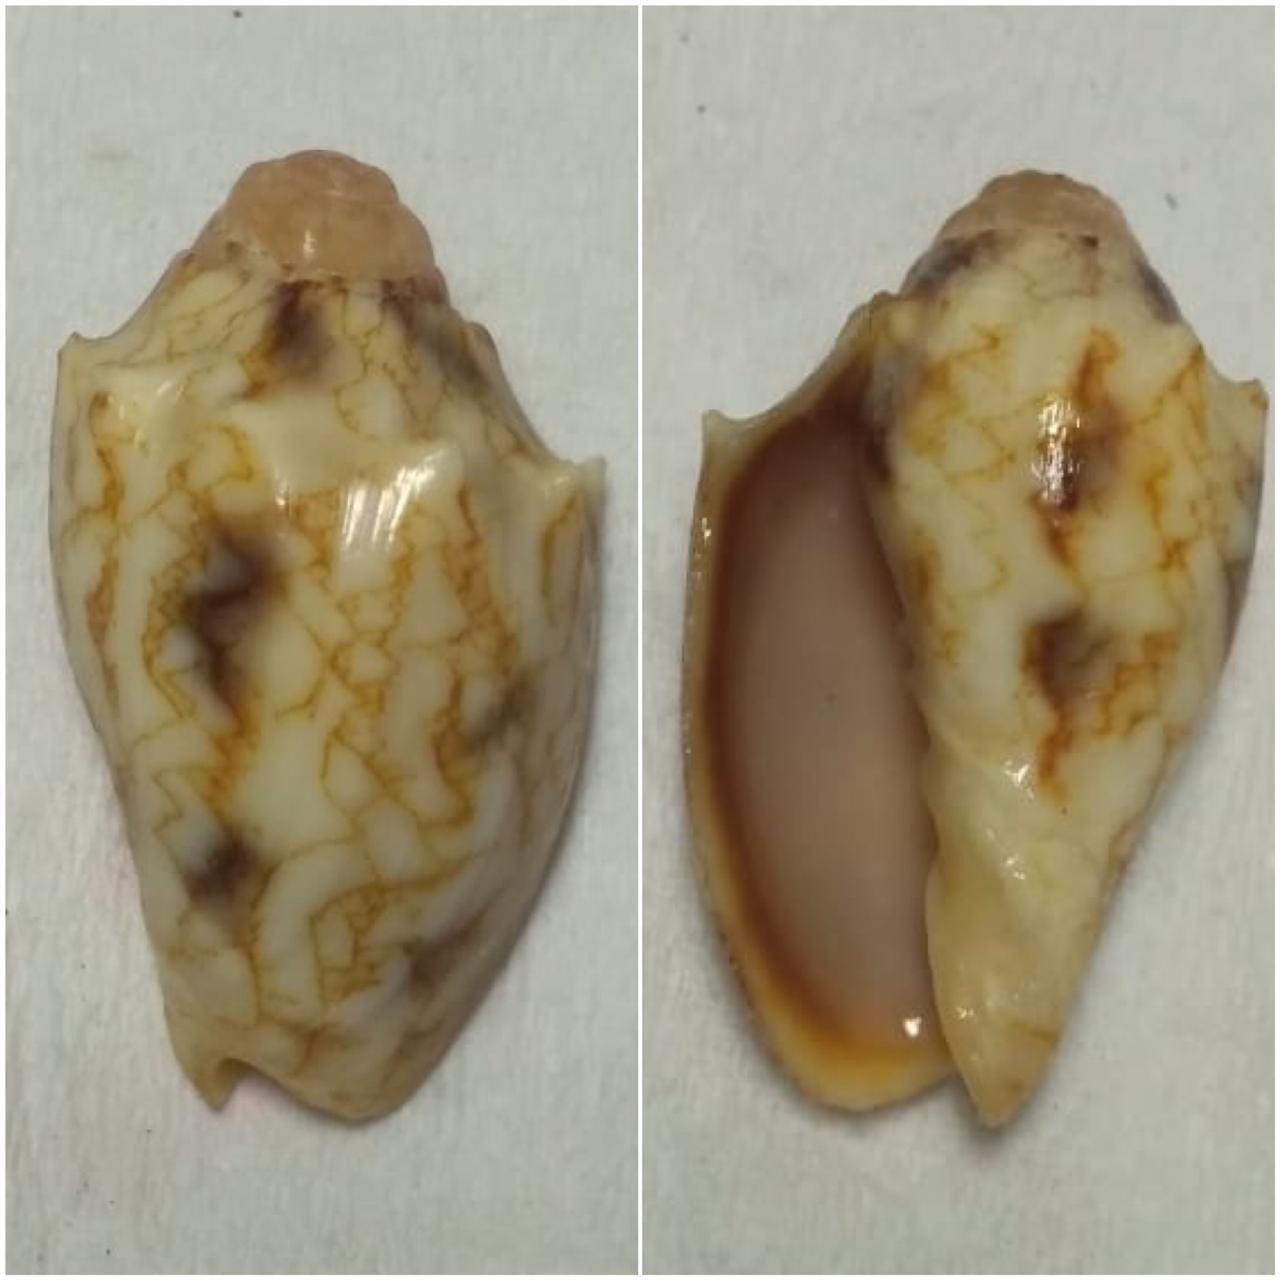 Cymbiola vespertilio (Linnaeus, 1758) 1